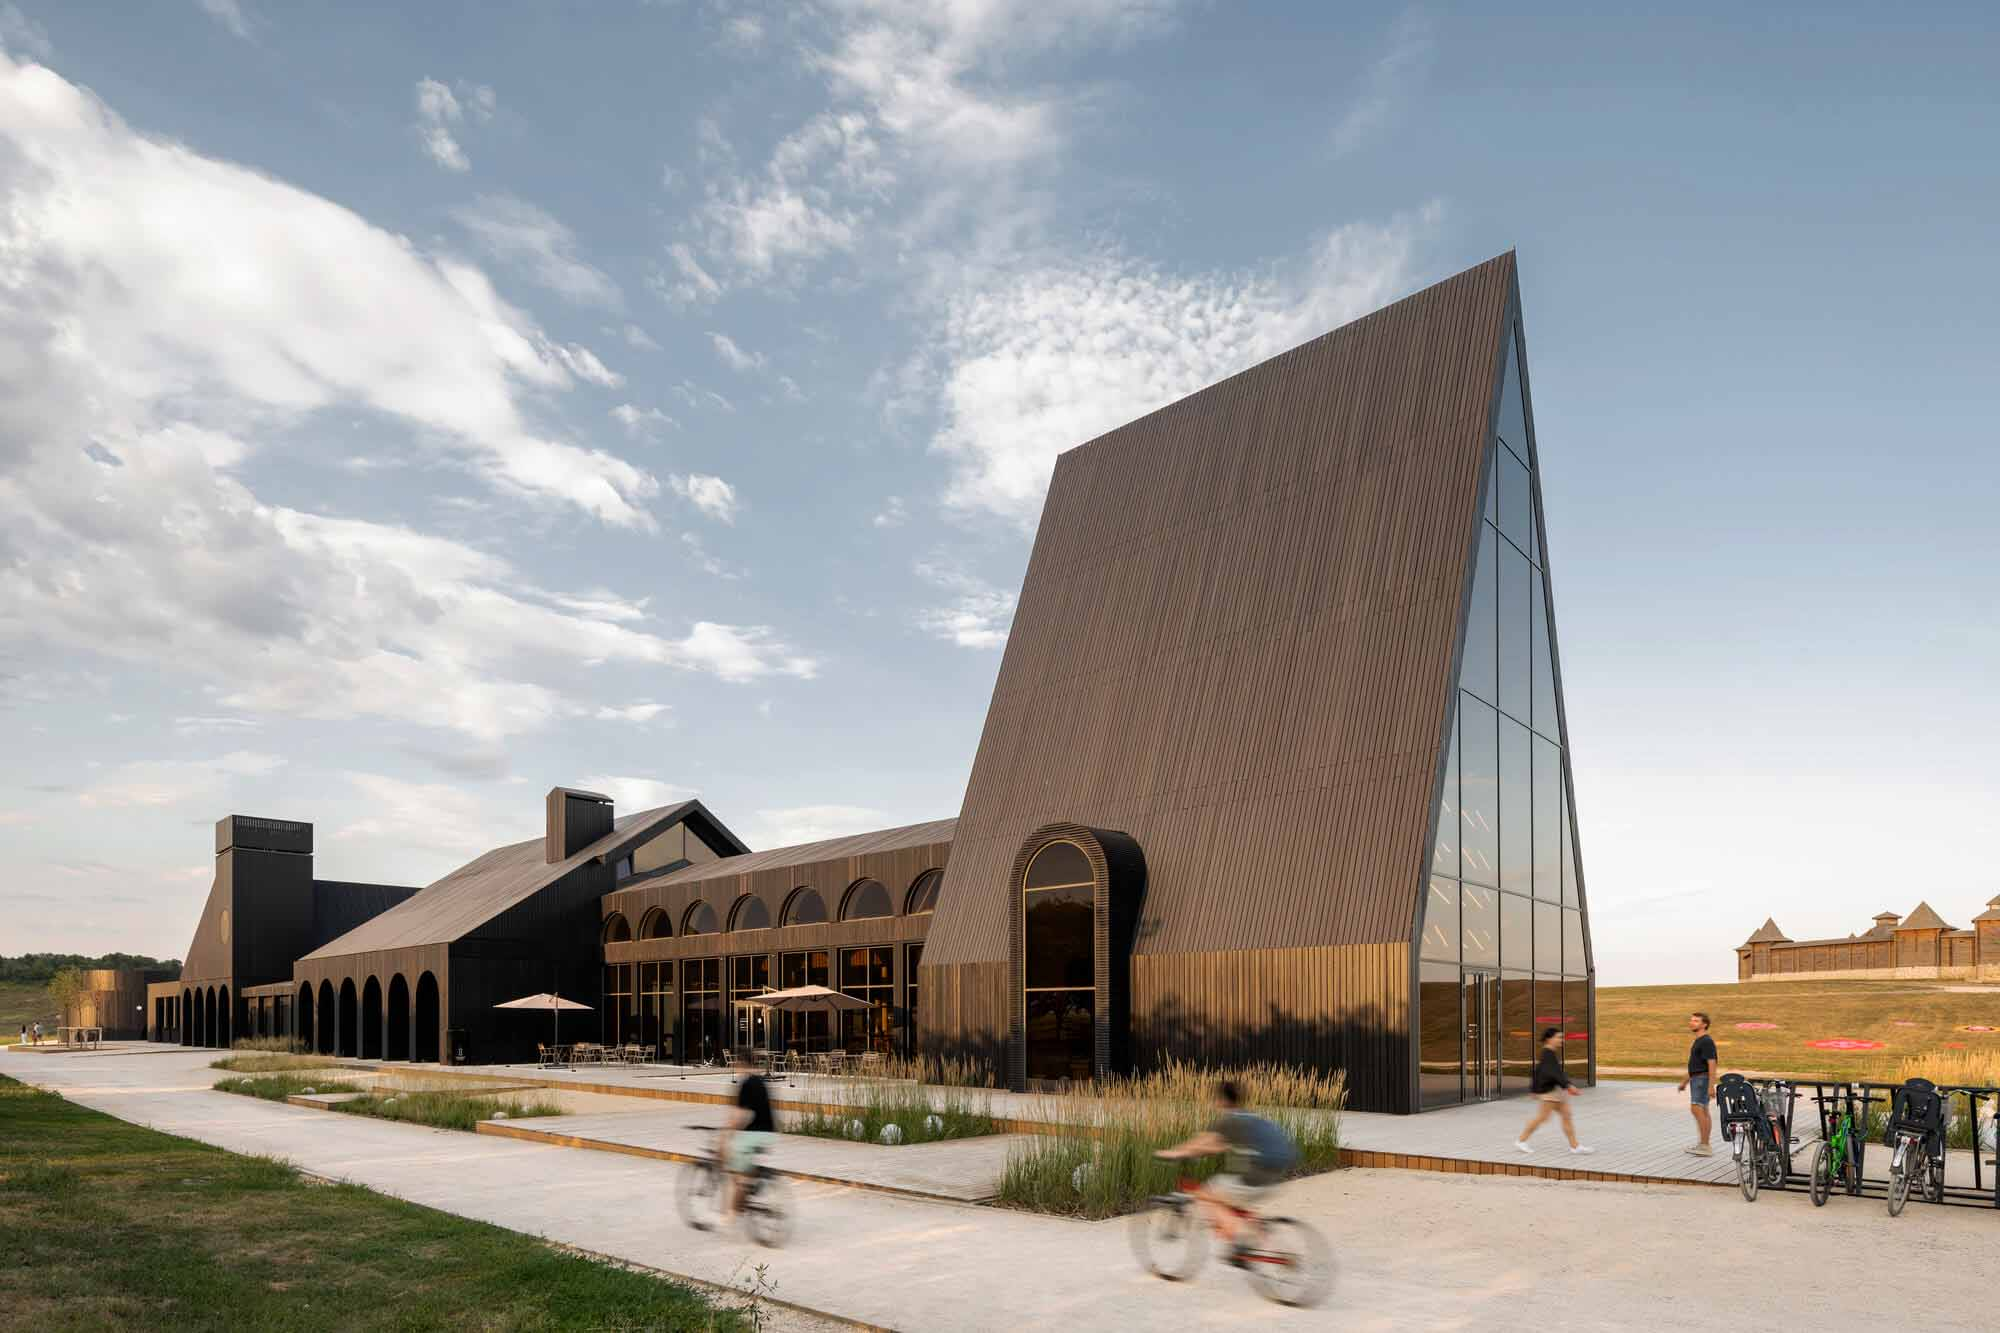 Центр гостеприимства / Архитектурное бюро Wowhaus